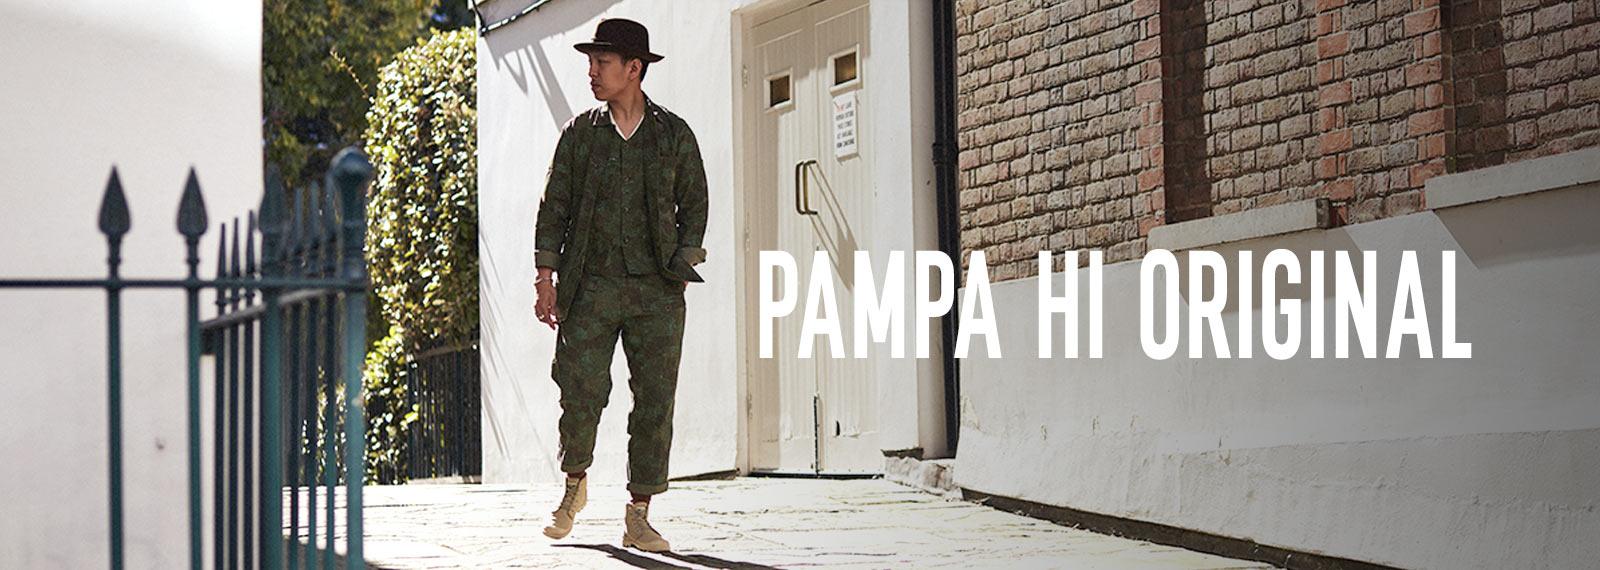 PAMPA HI ORIGINALE